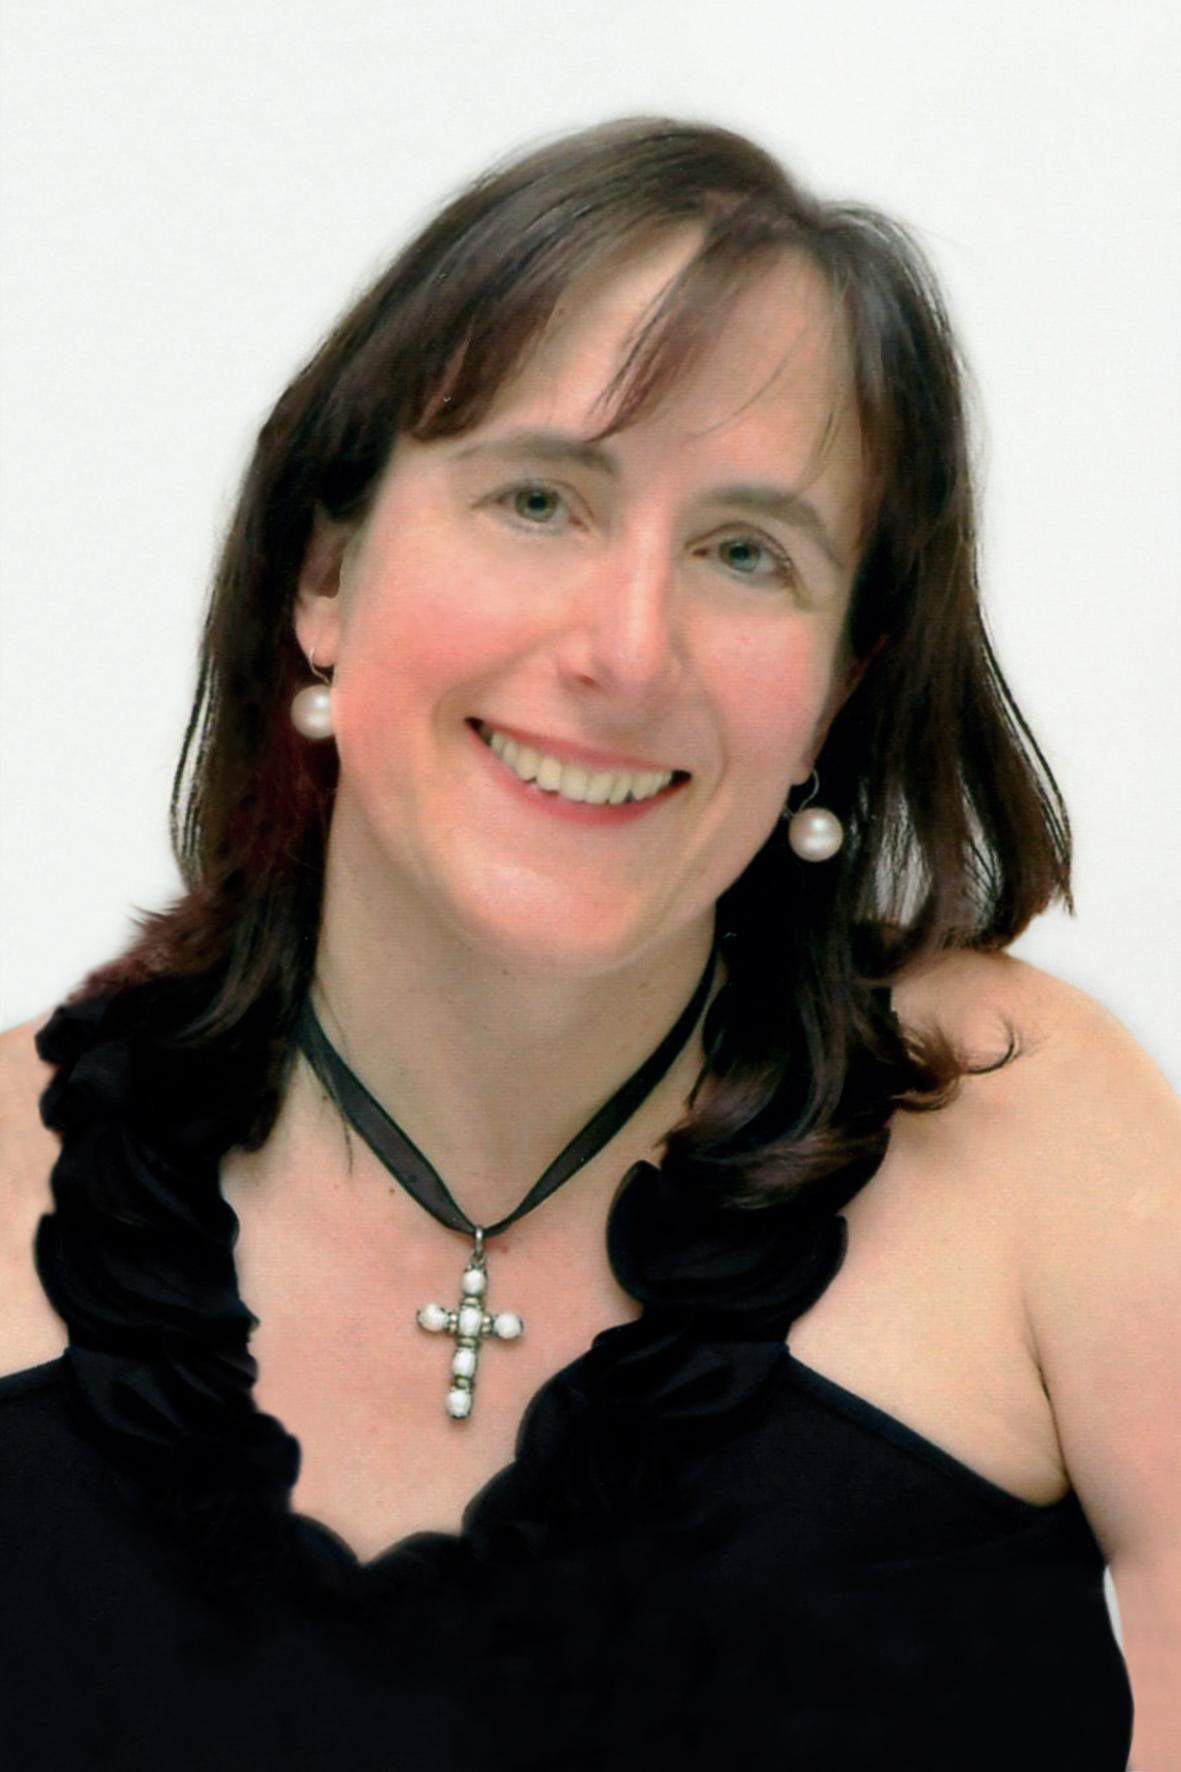 Natércia Maria Ferreira dos Santos